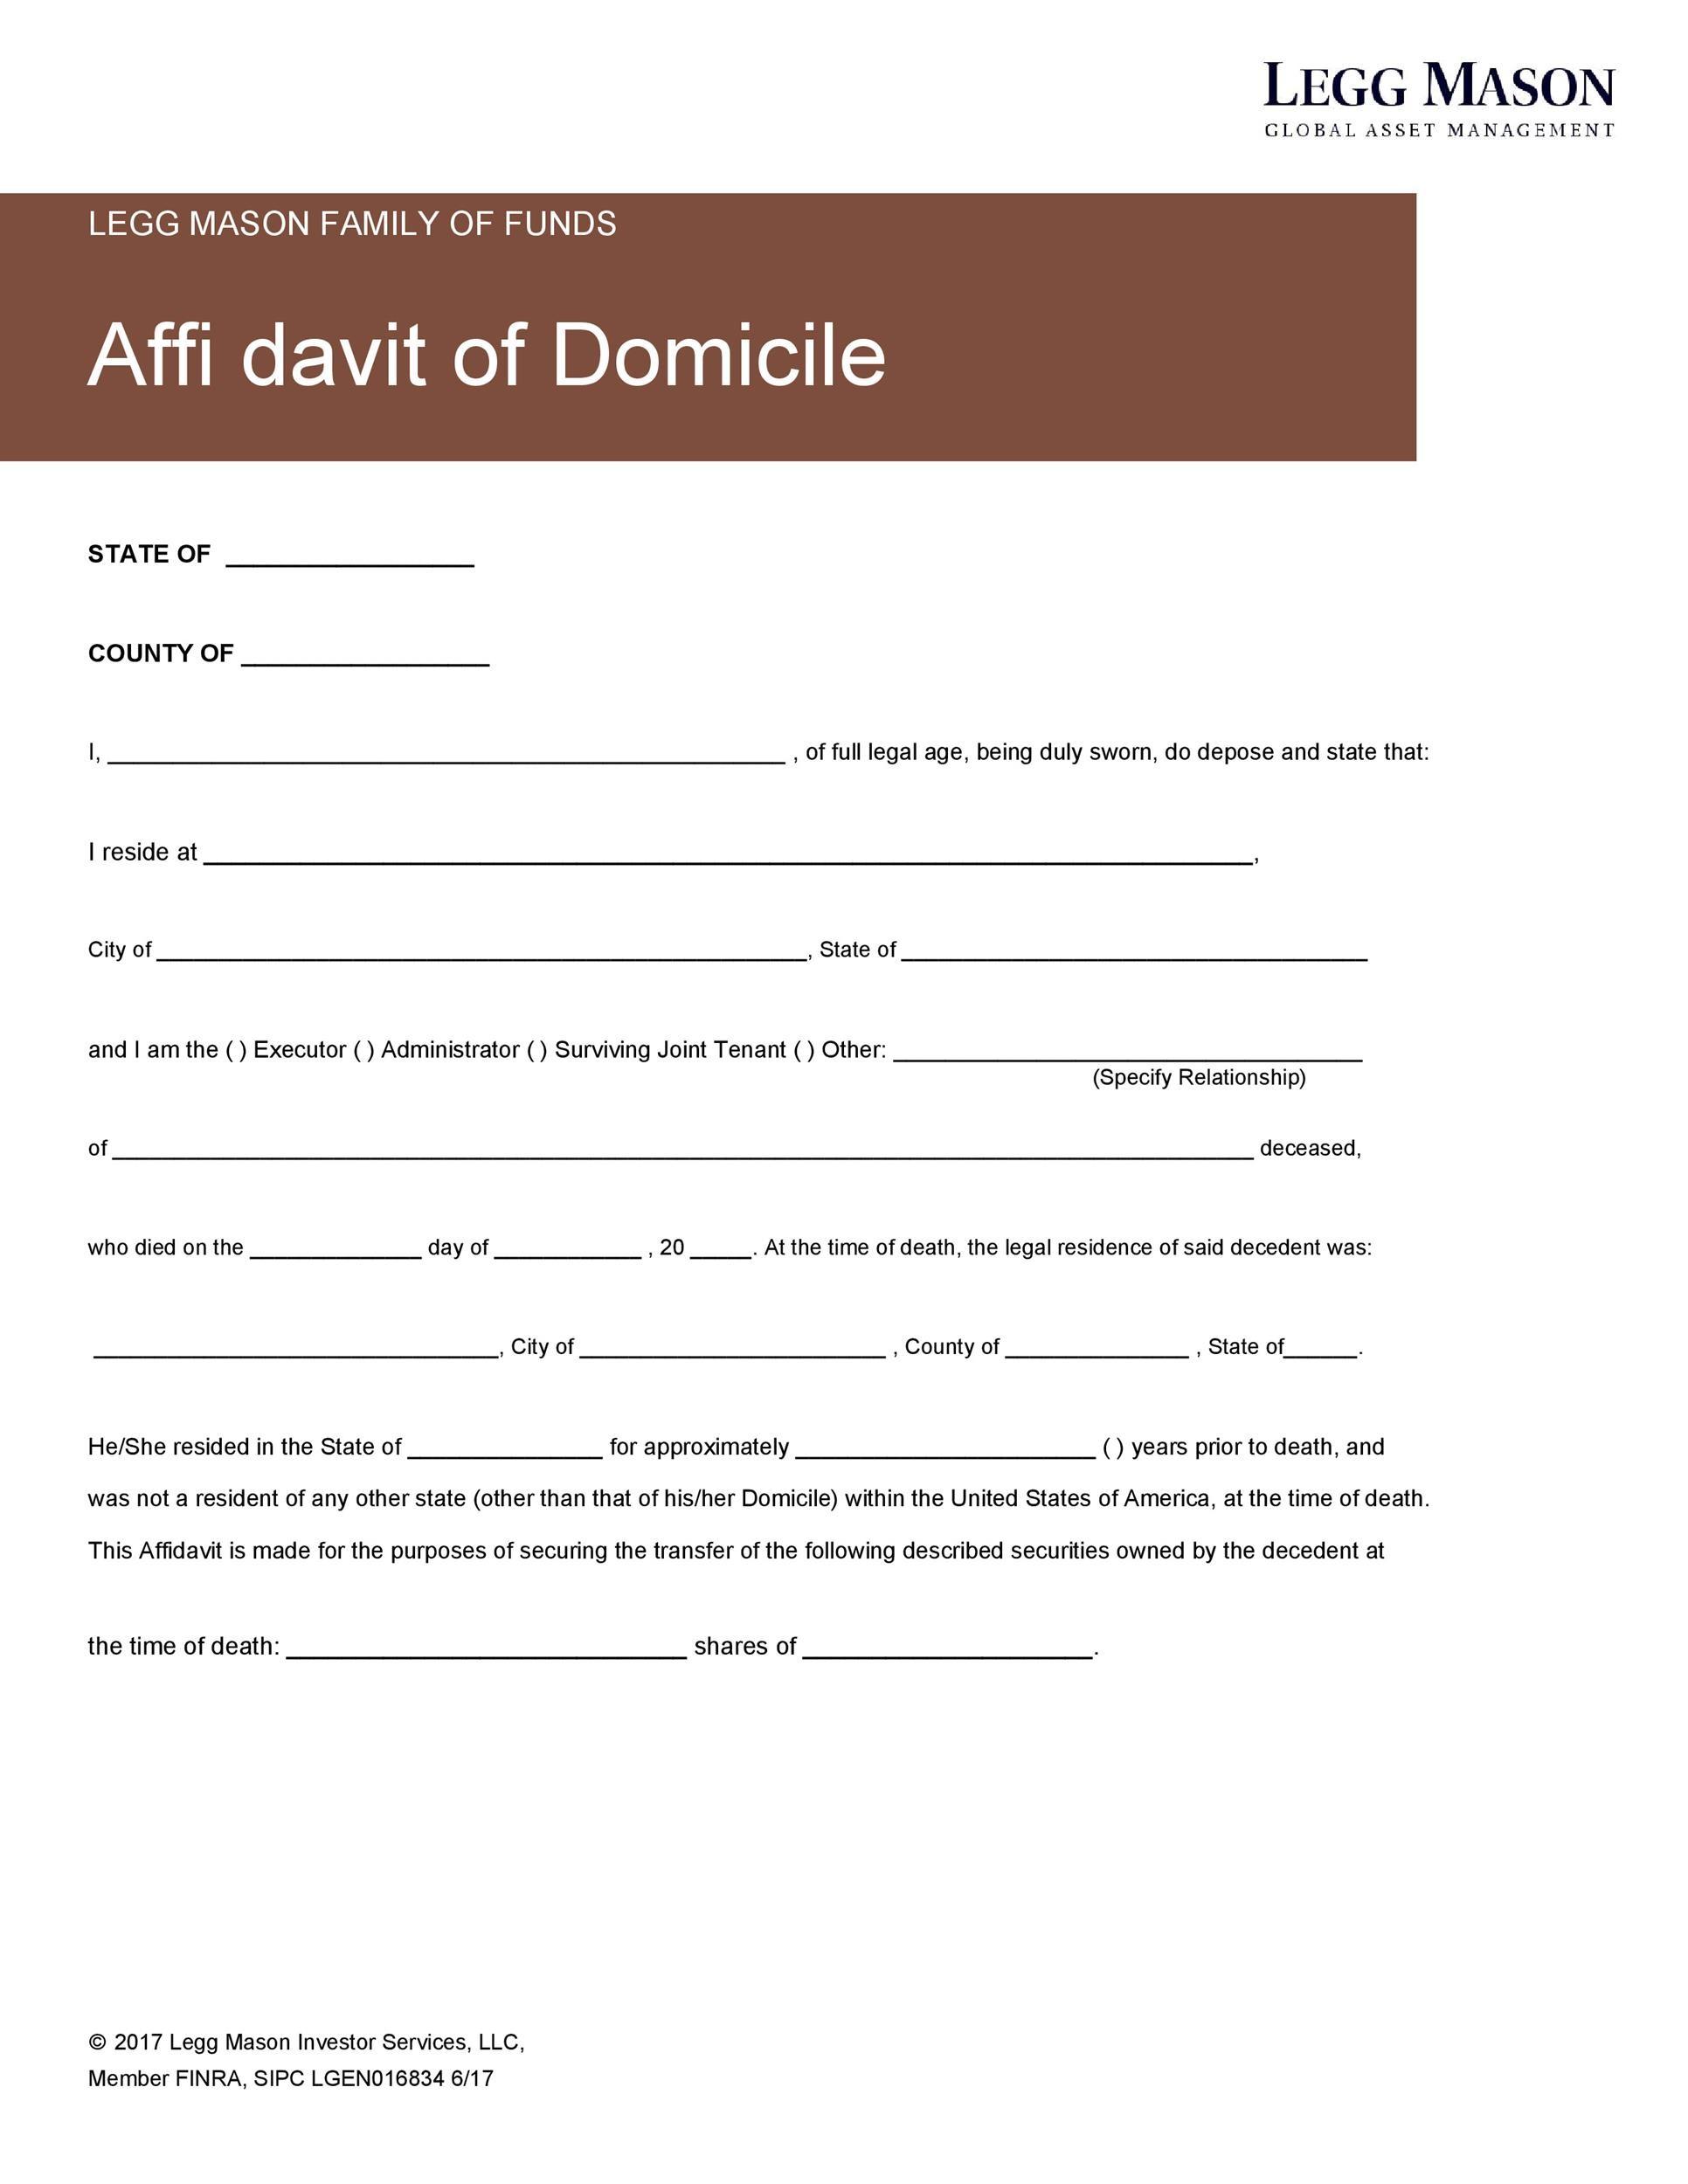 Free affidavit of domicile 07